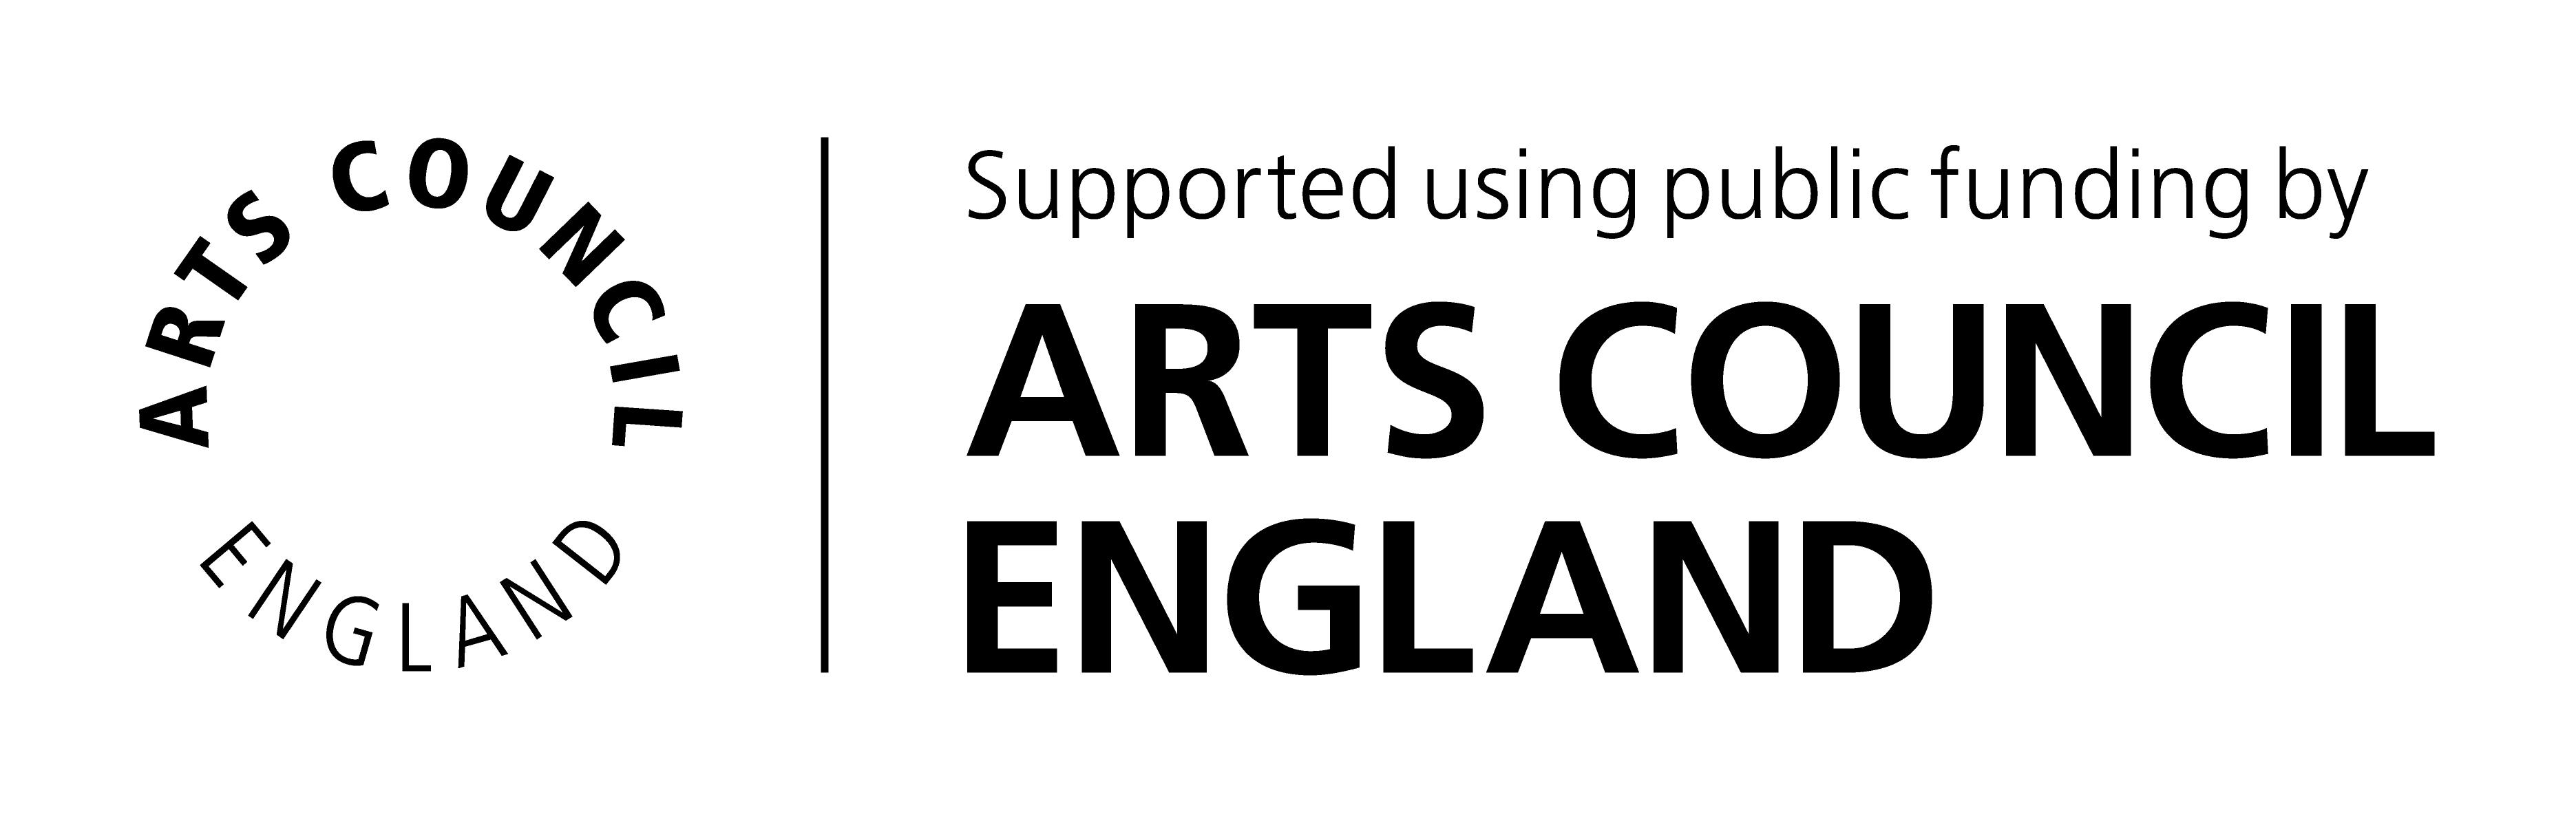 https://www.artscouncil.org.uk/